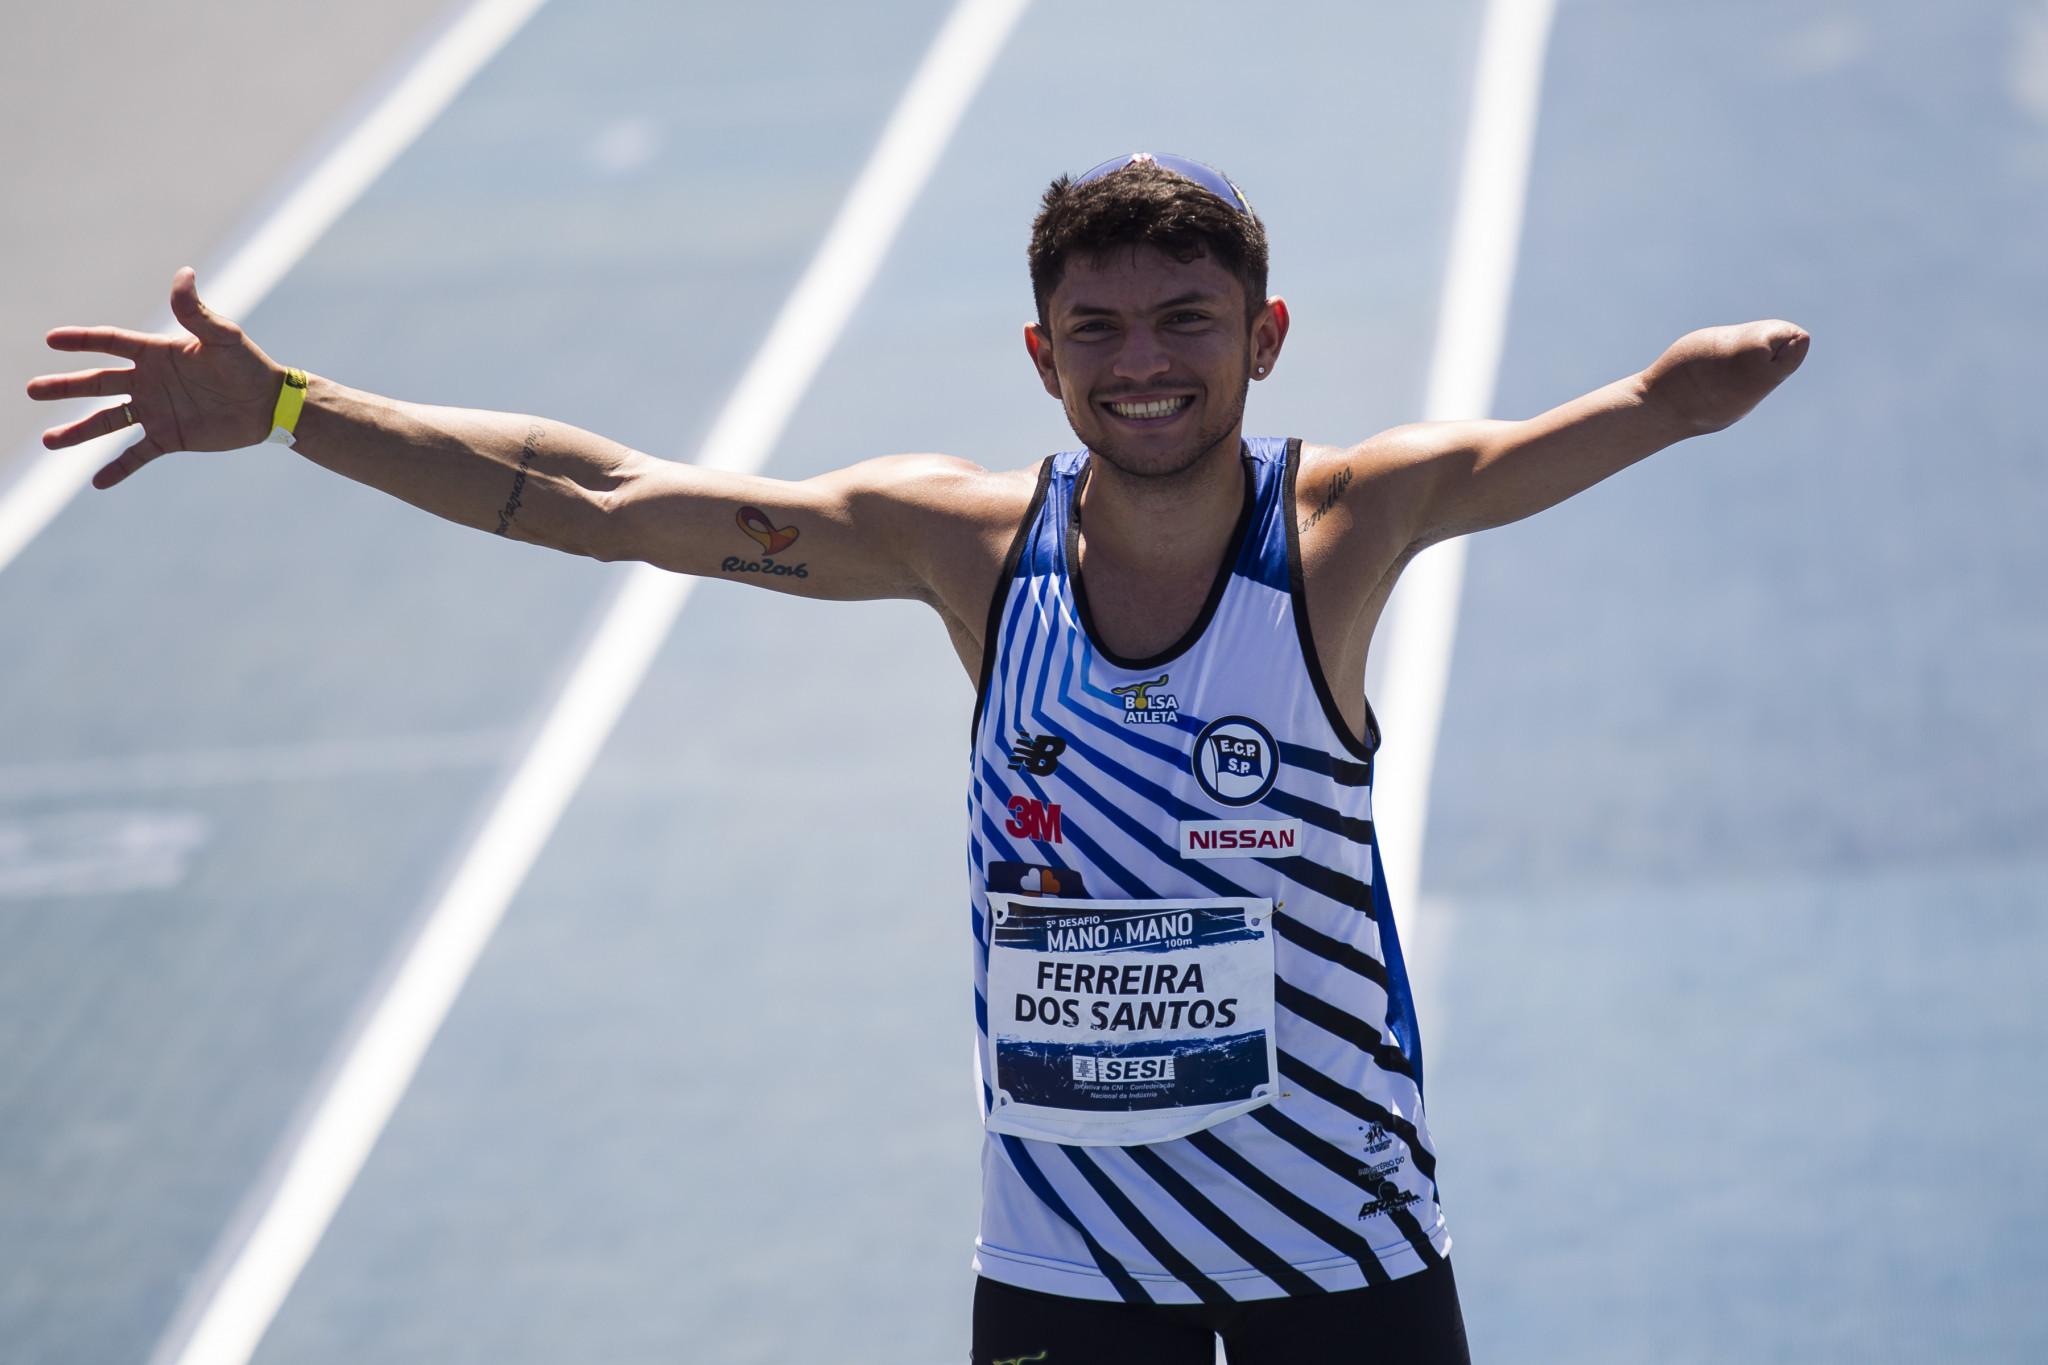 Brazilian world champions seeking home success at World Para Athletics Grand Prix